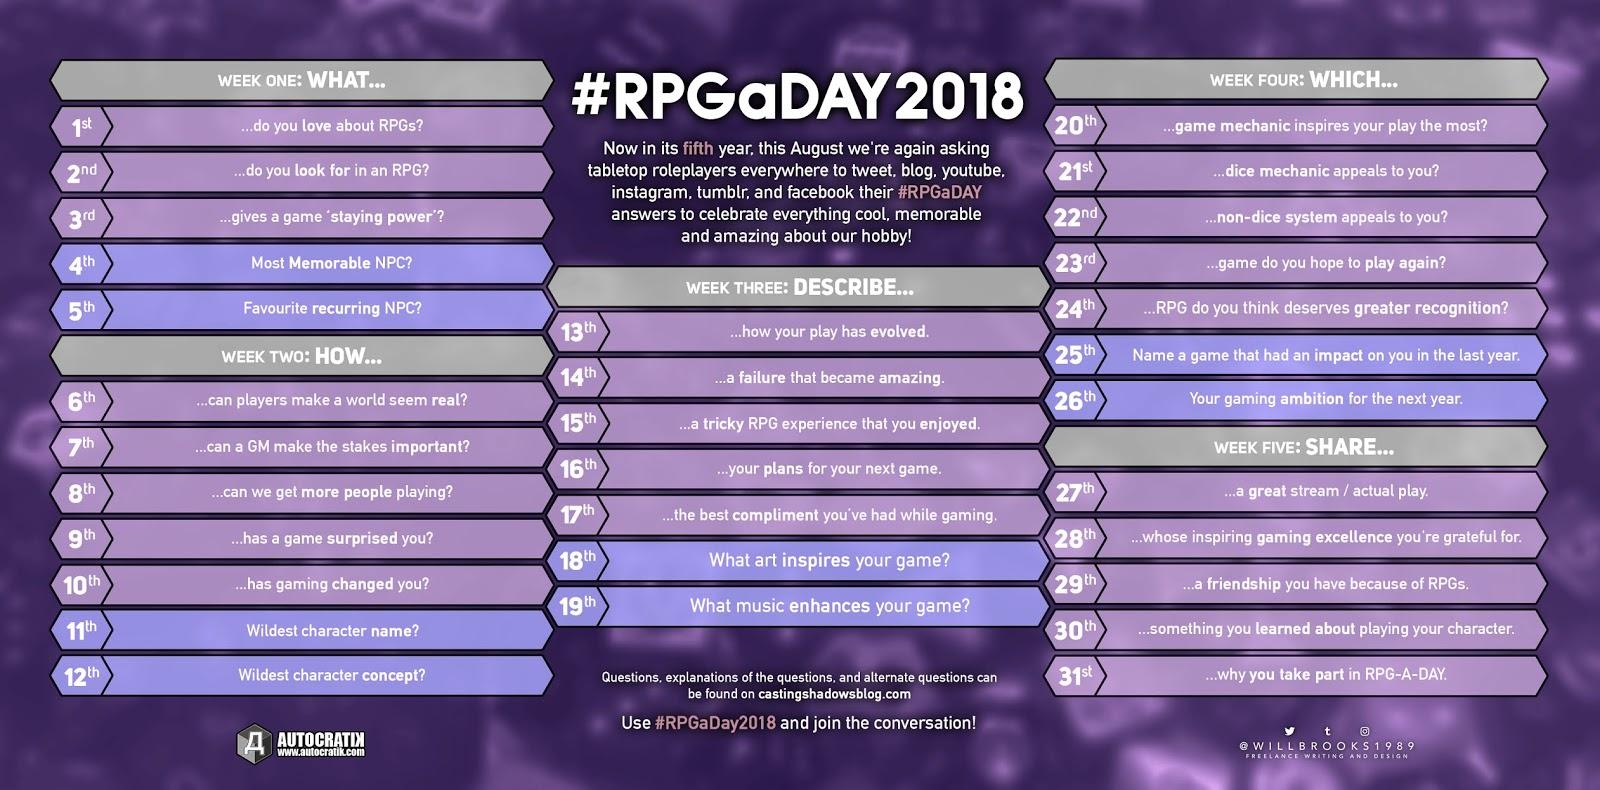 RPG-a-Day 2018 (1)